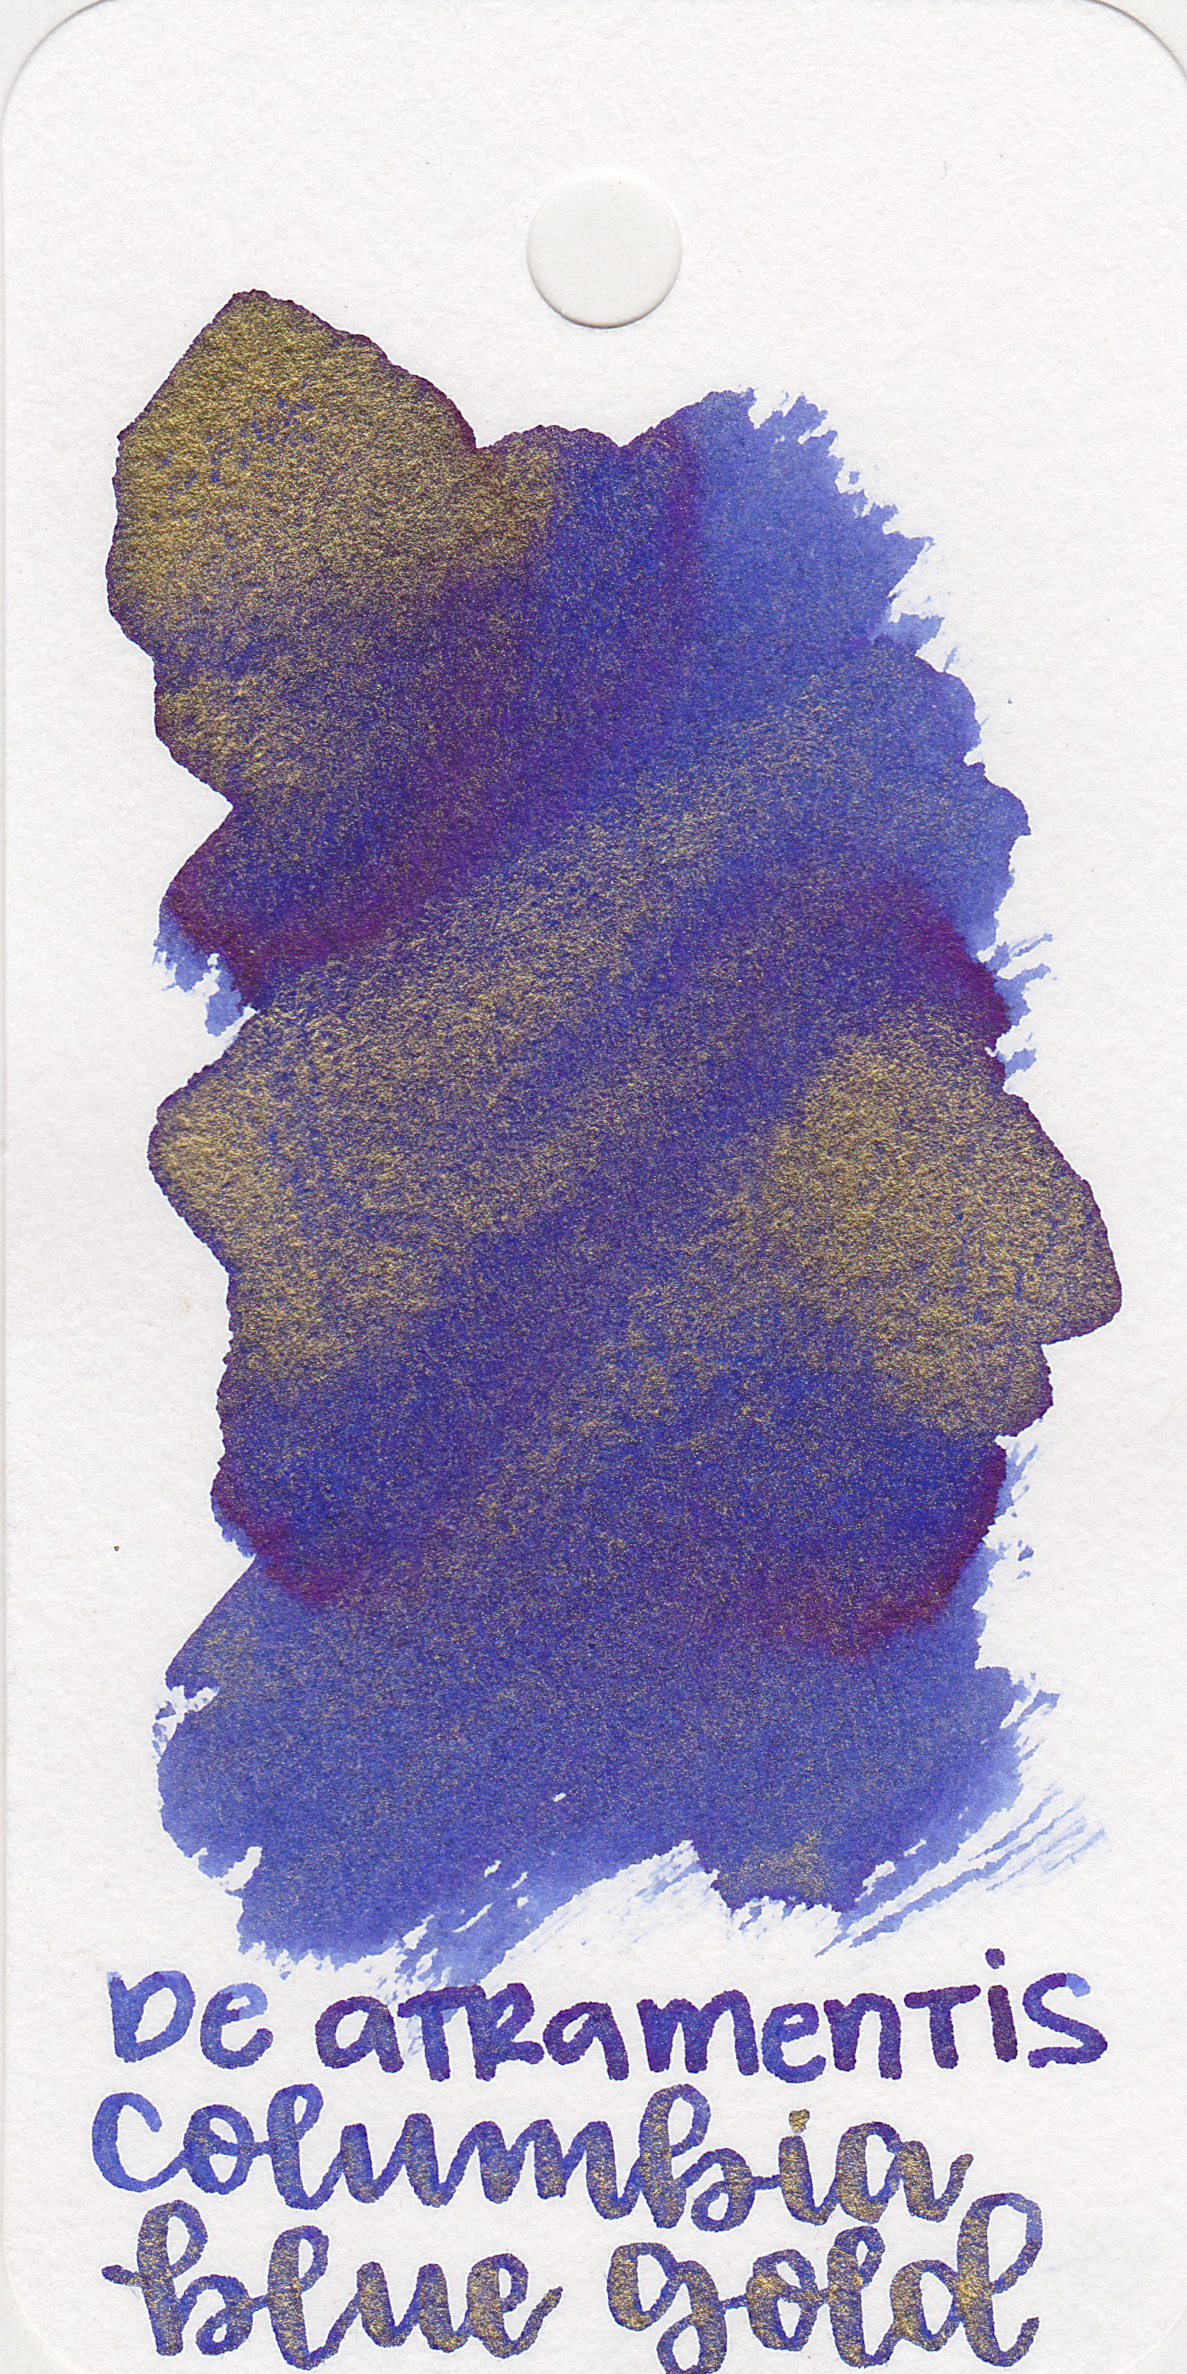 da-columbia-blue-1.jpg